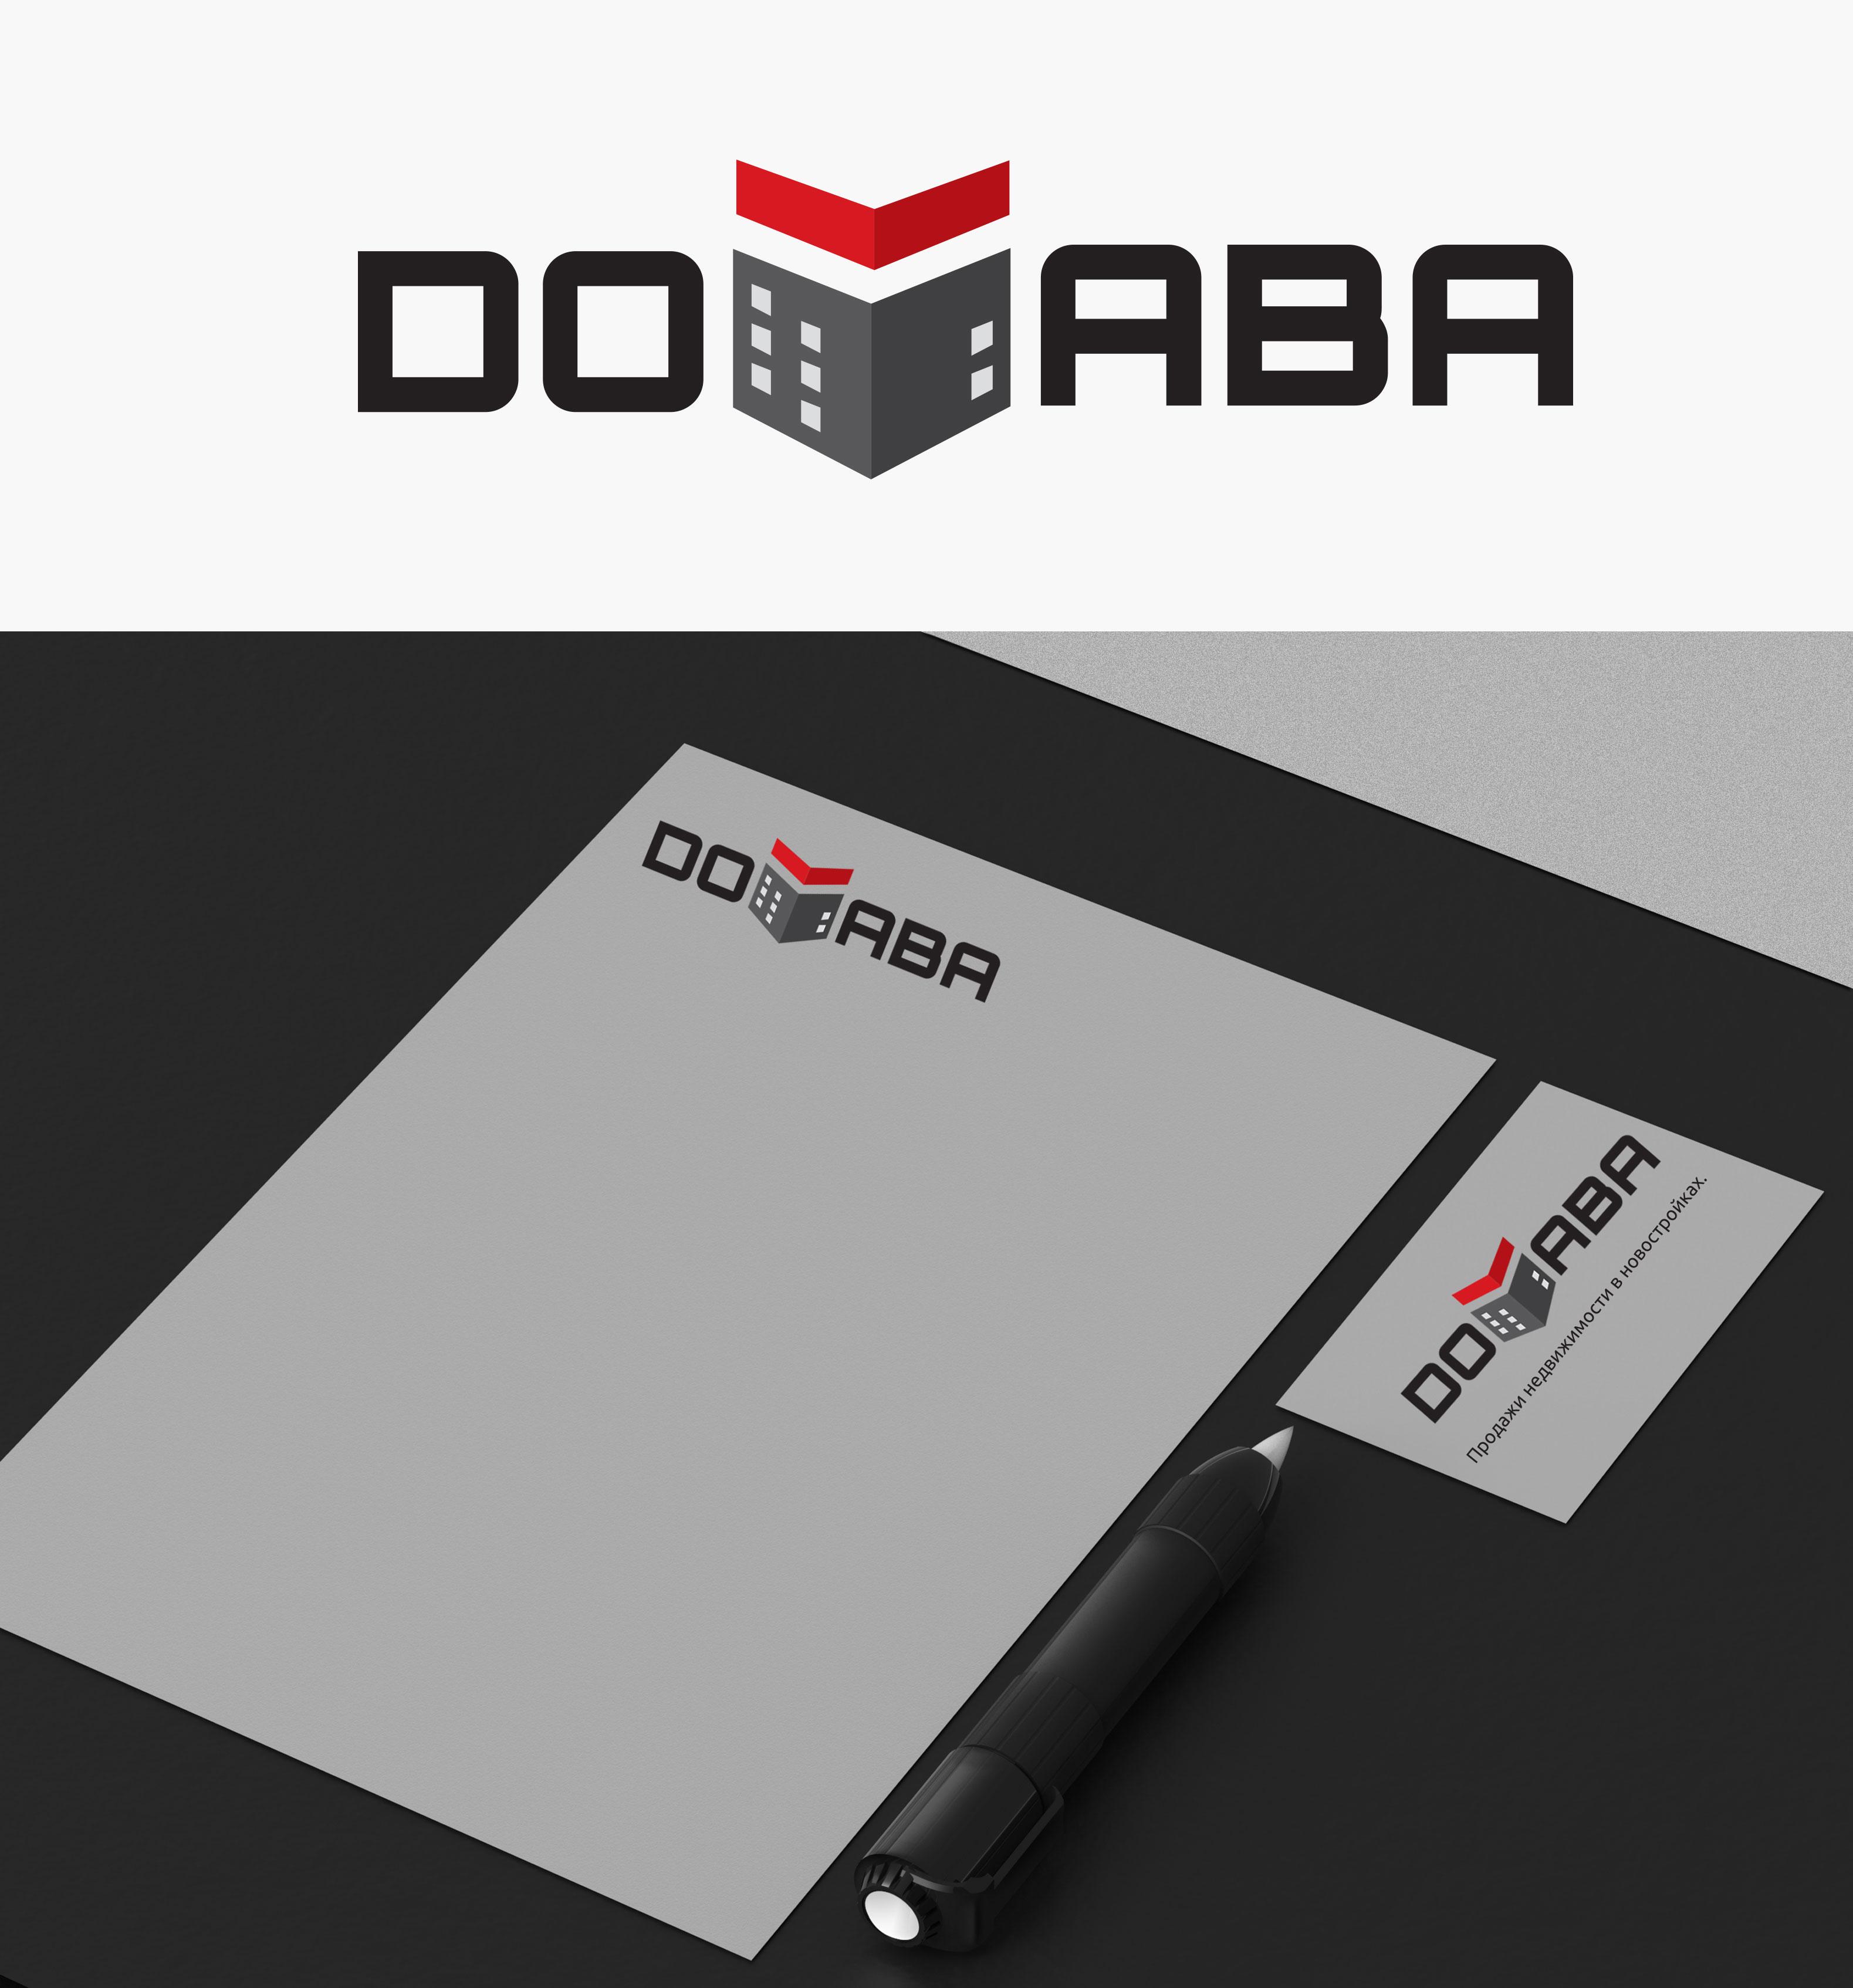 Разработка логотипа с паспортом стандартов фото f_8705ba17bb562606.jpg